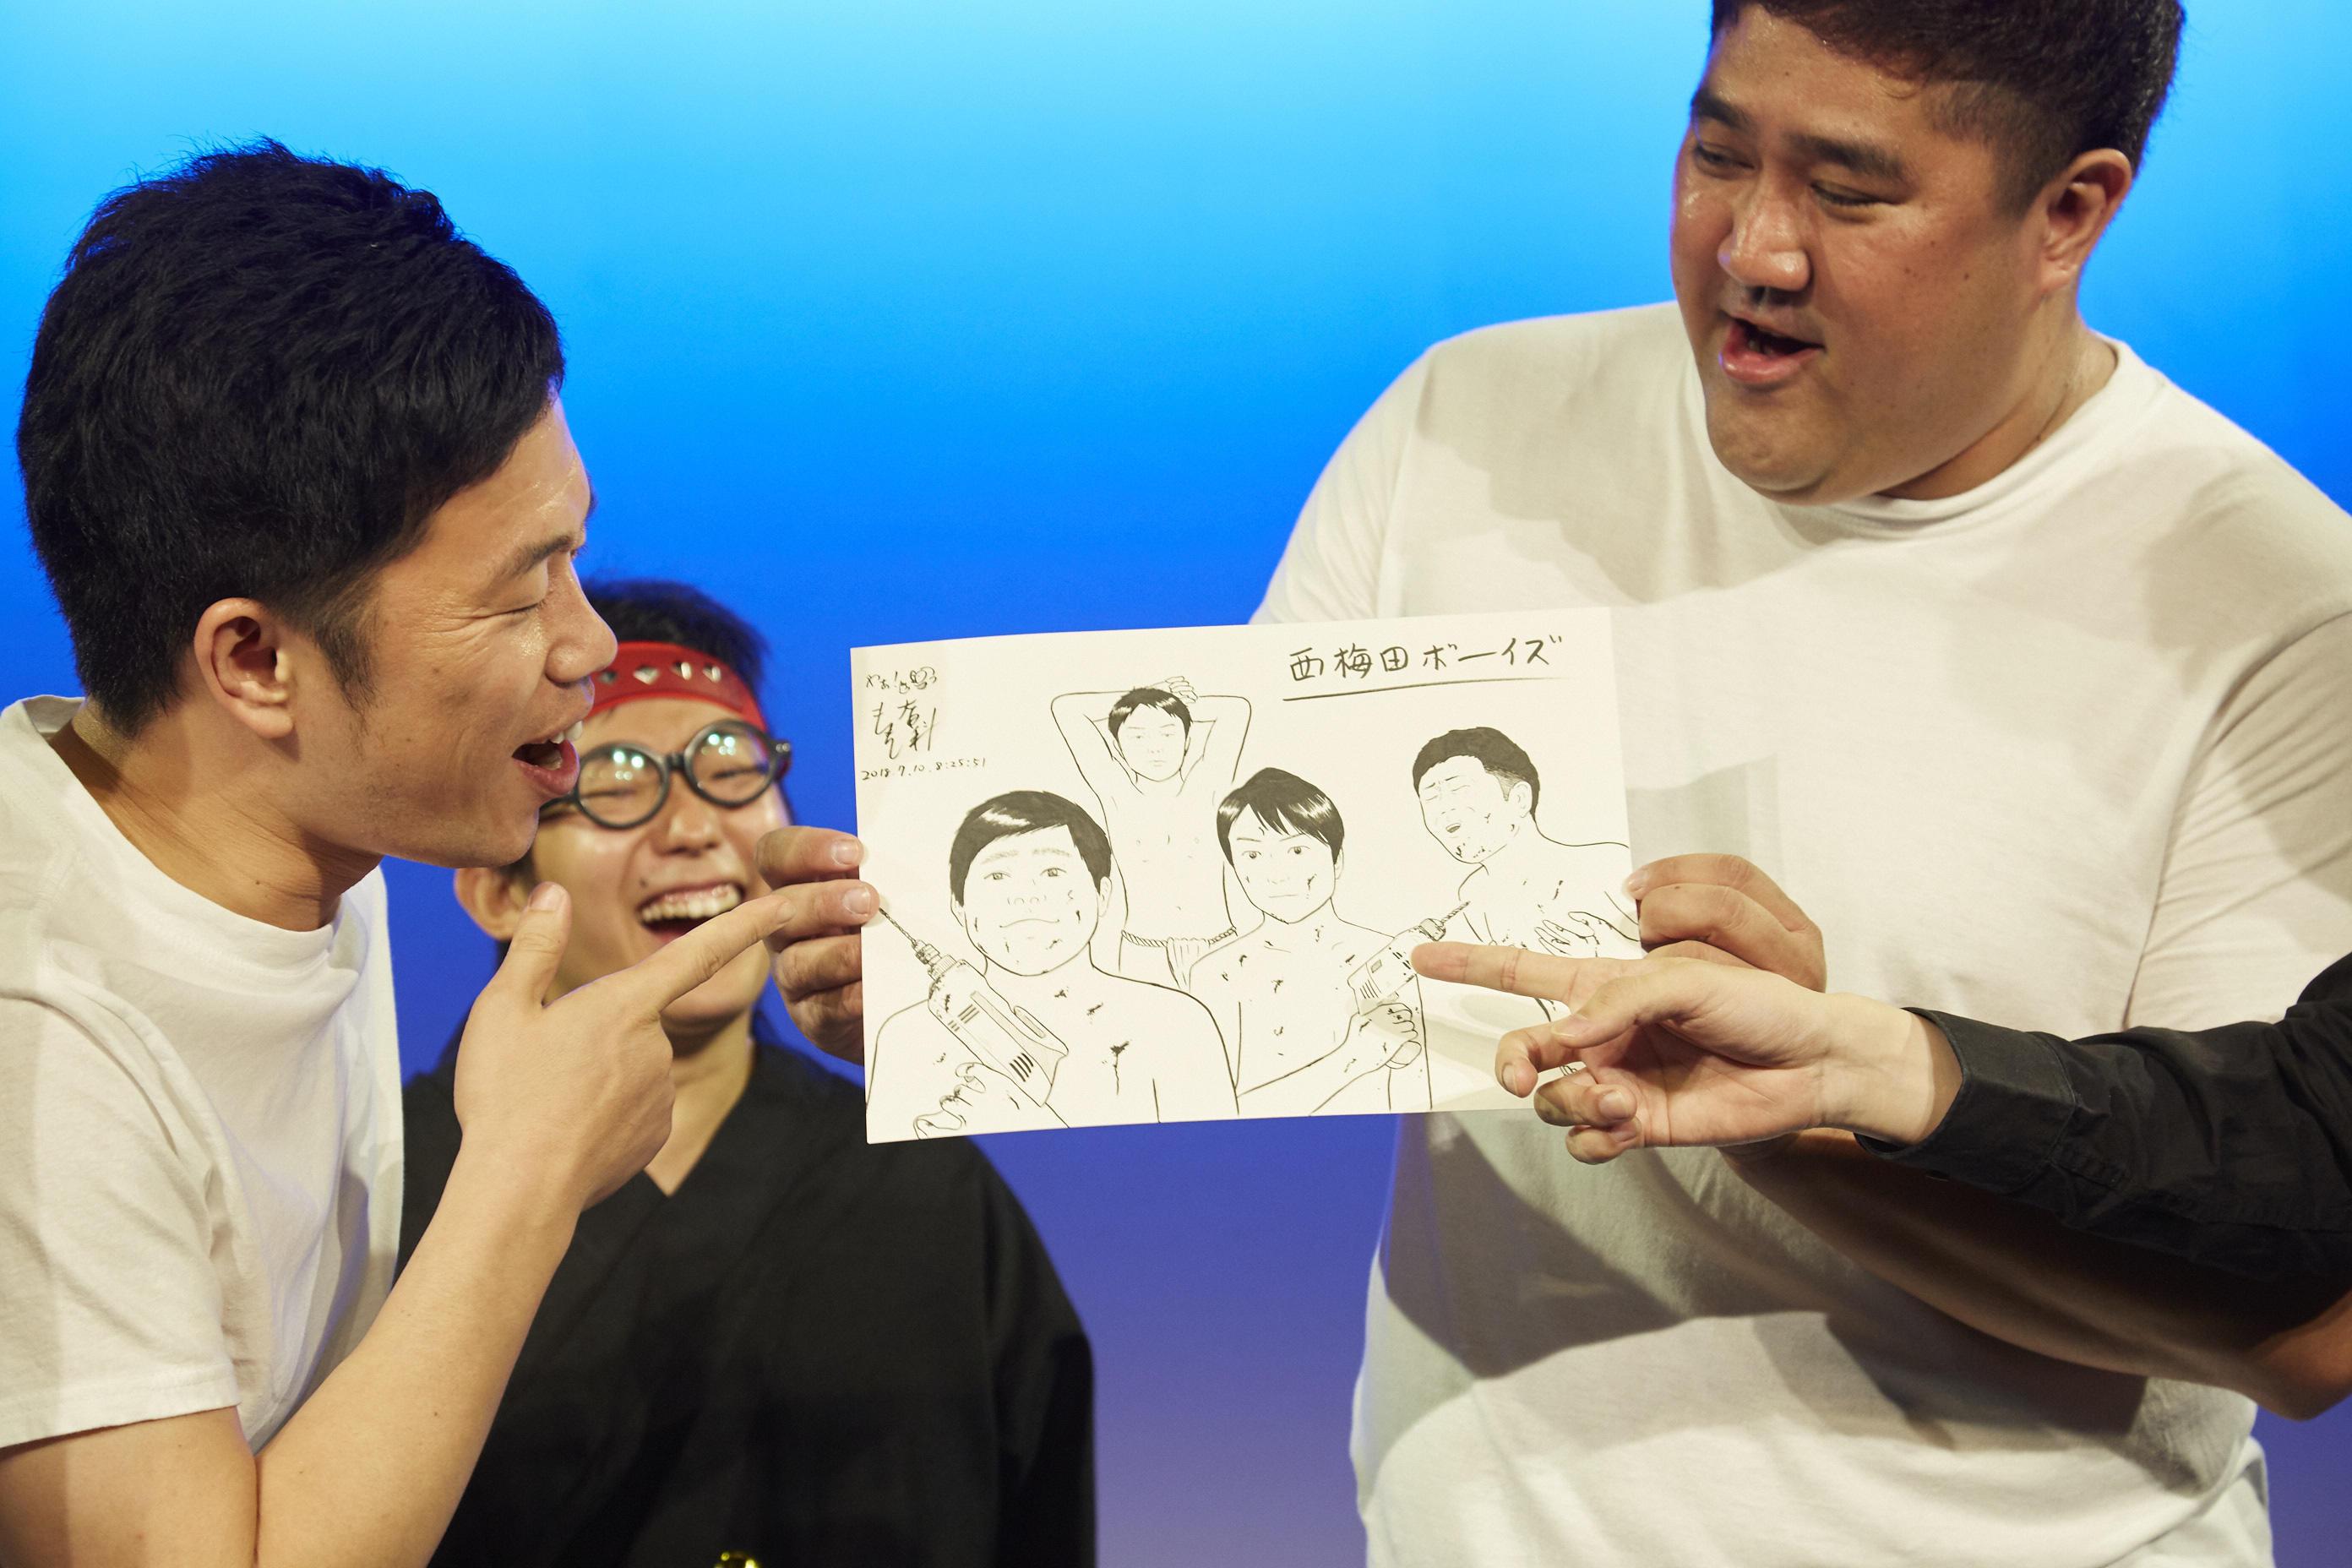 http://news.yoshimoto.co.jp/20180711201025-12433472da7f8ebd767968e7c95ea341839f80ed.jpg